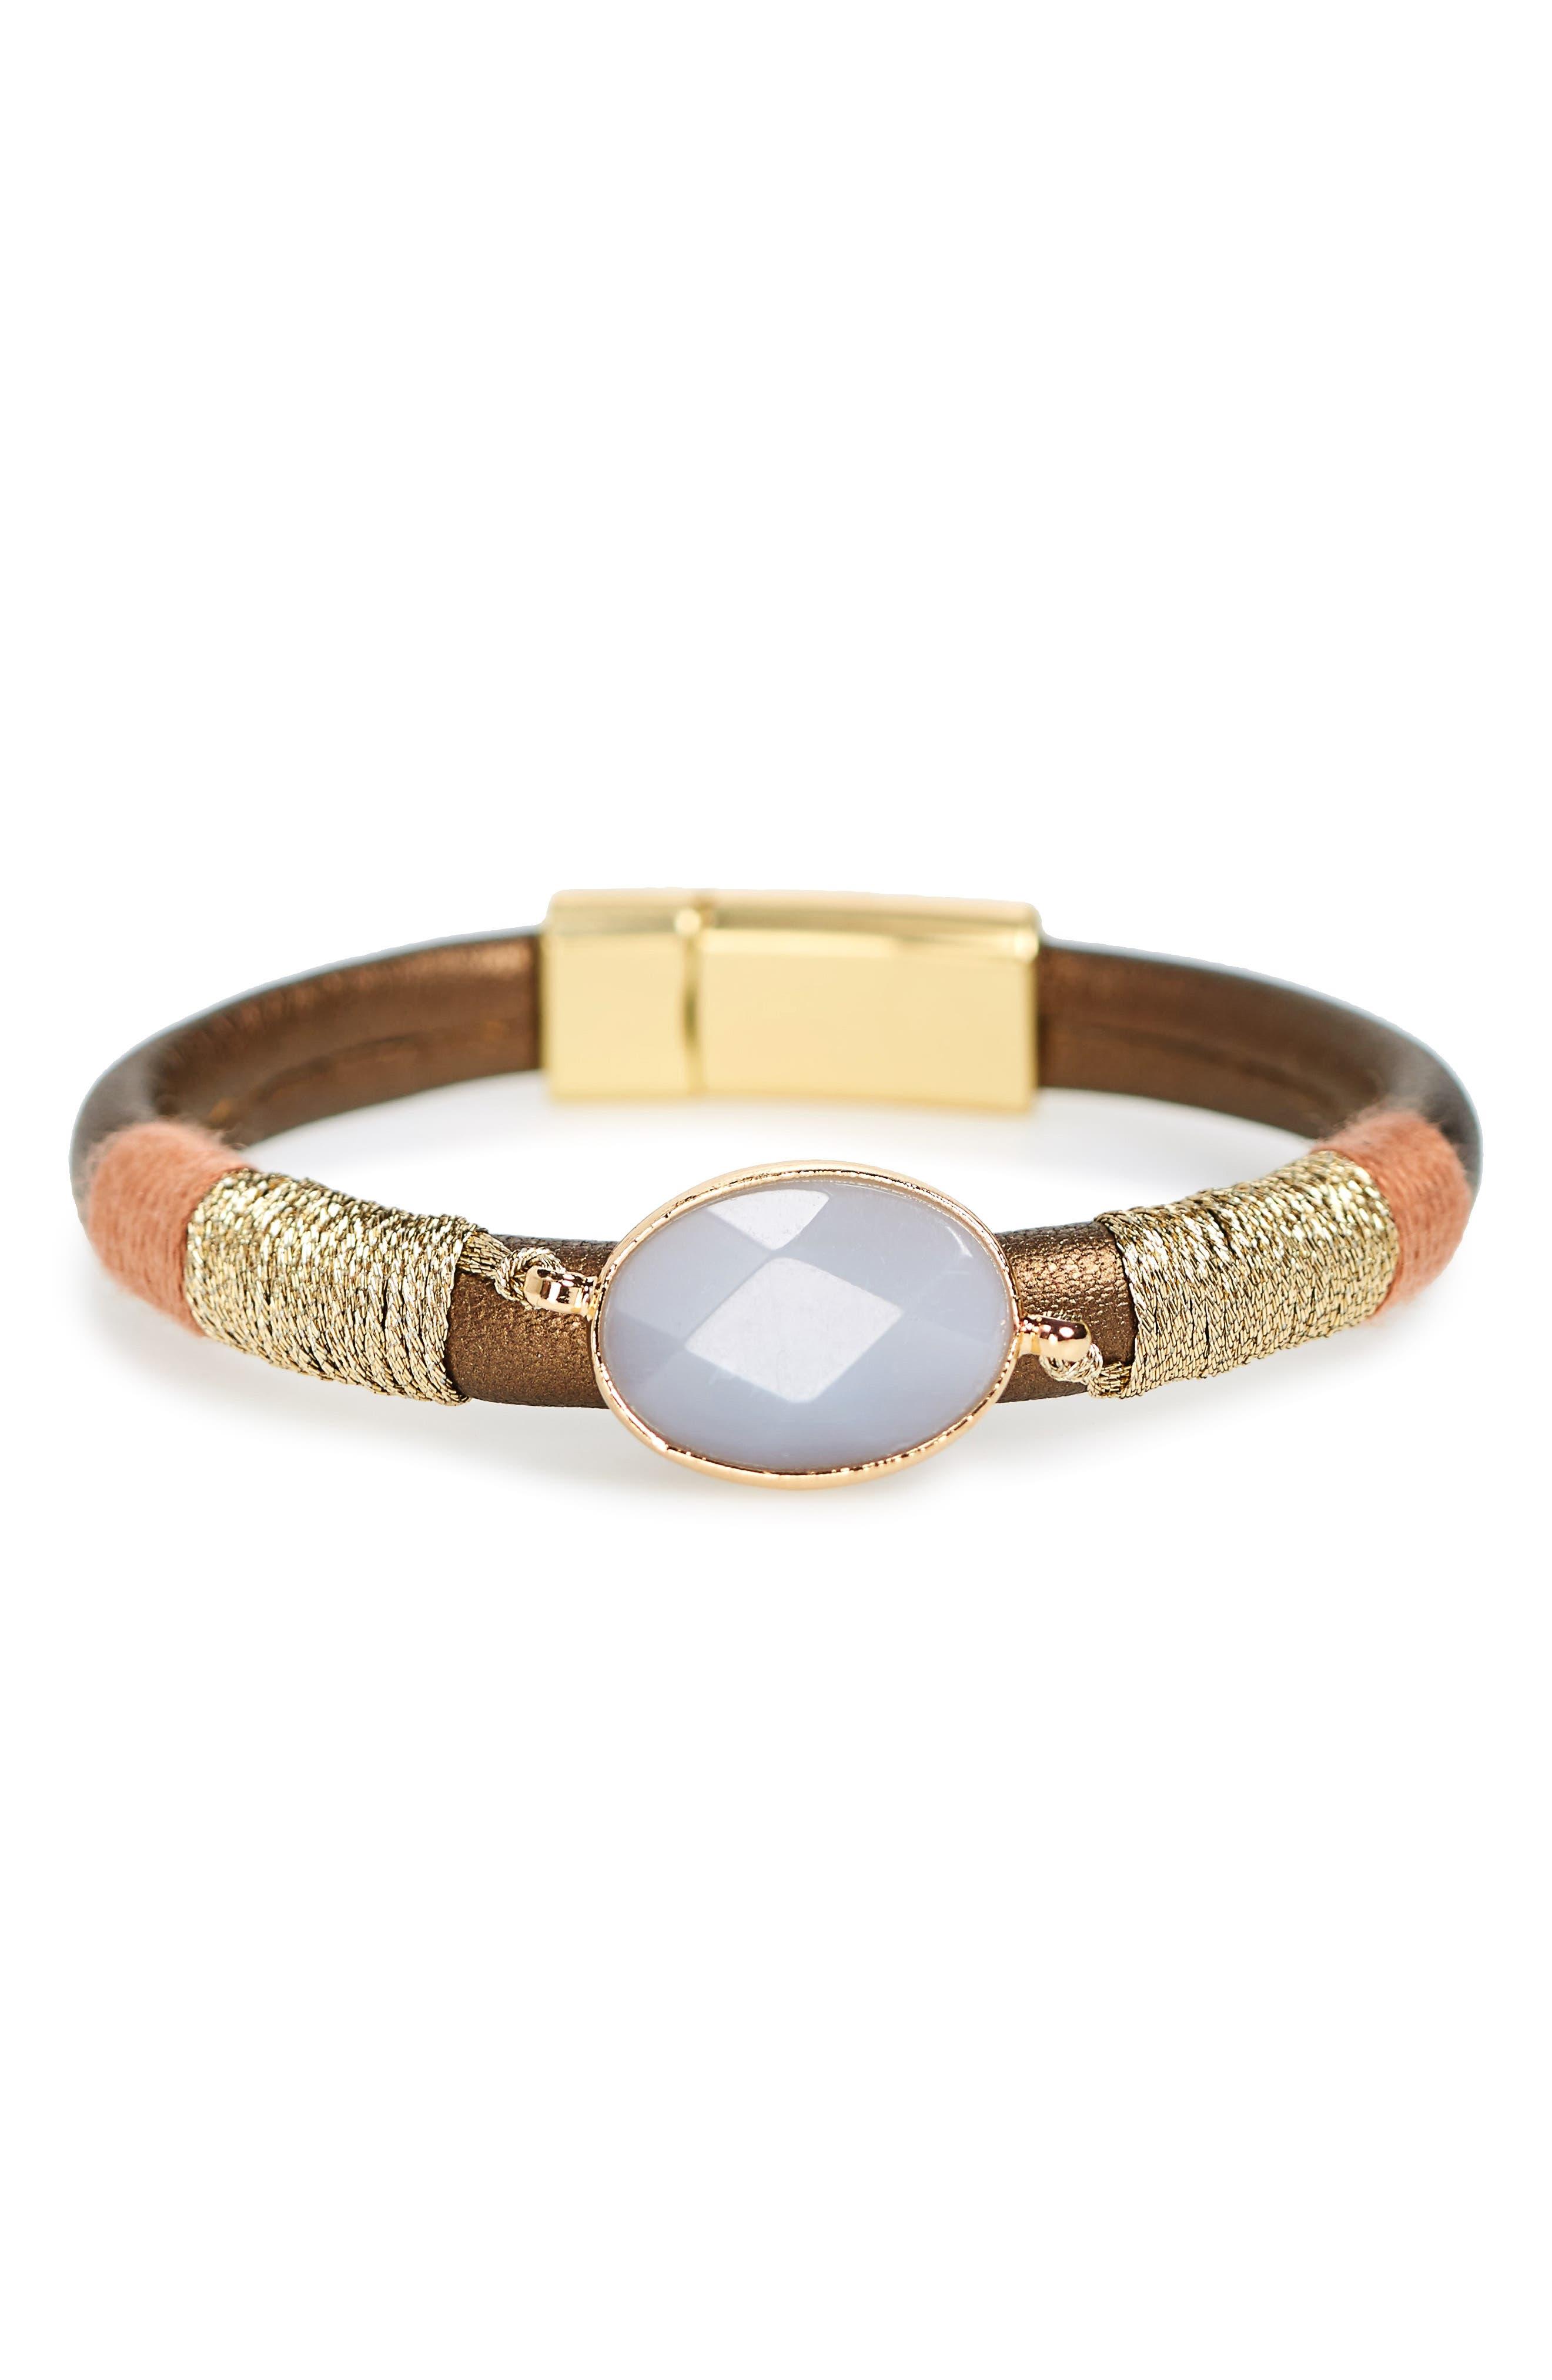 Leather & Agate Bracelet,                             Main thumbnail 1, color,                             Grey Multi